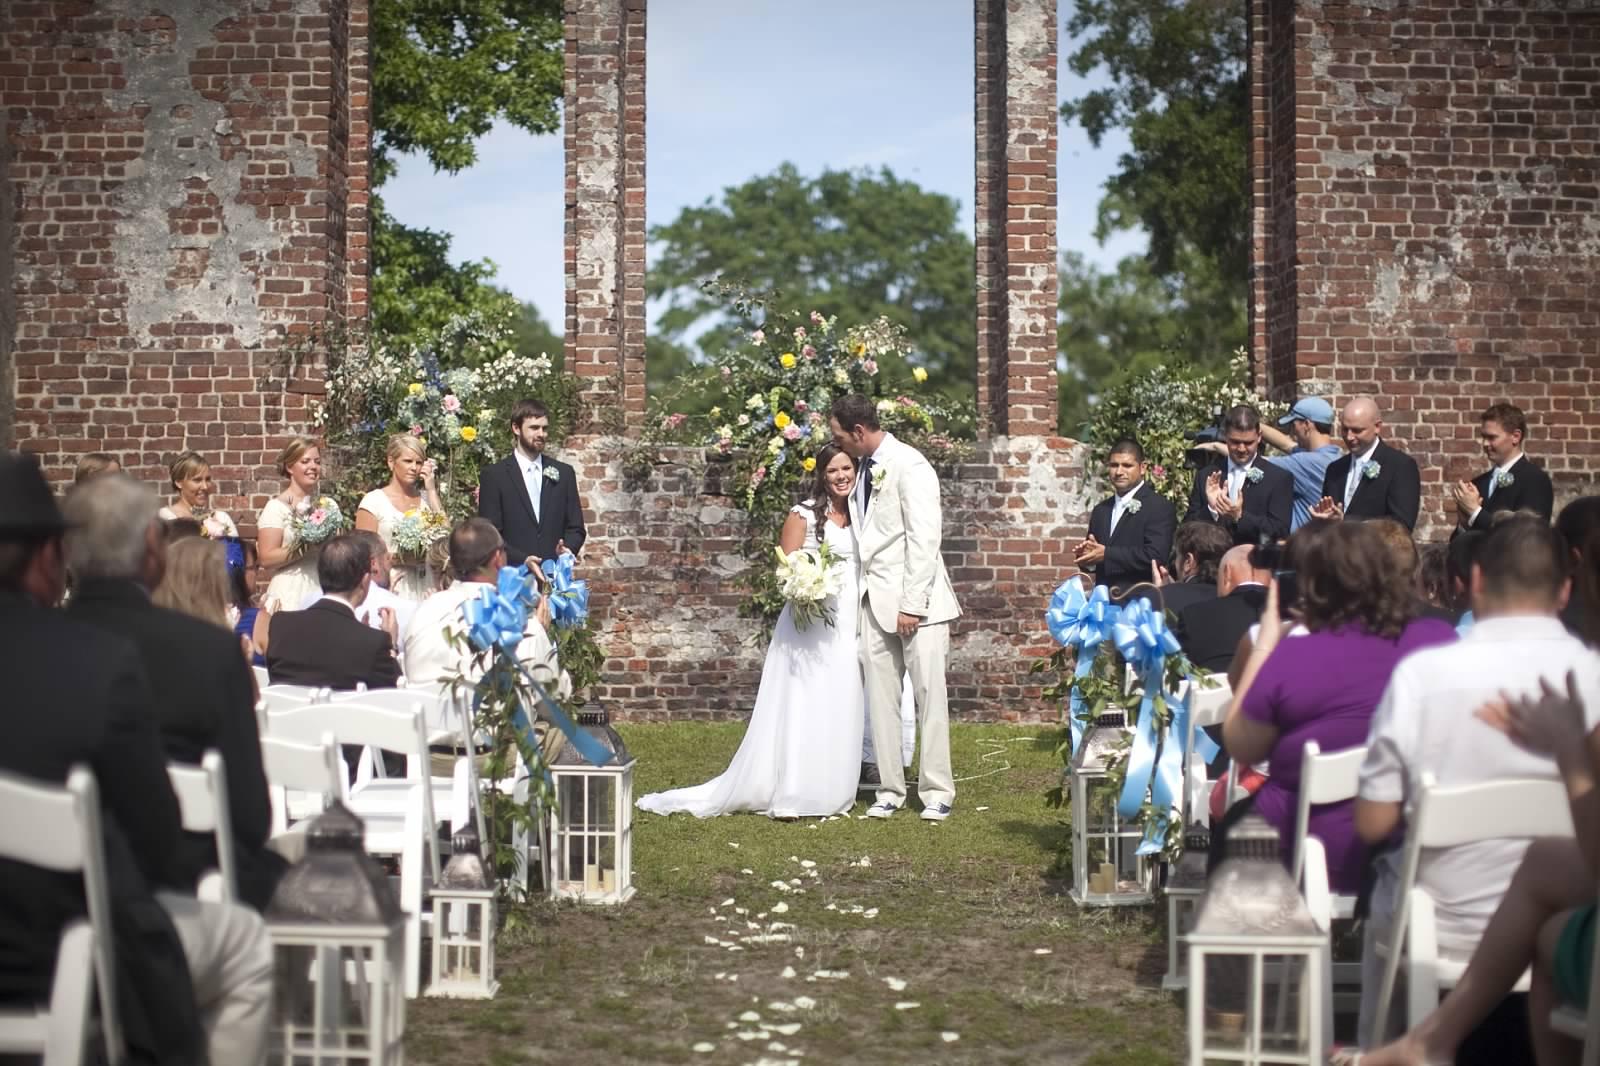 photographer brunswick town wedding planner wilmington nc